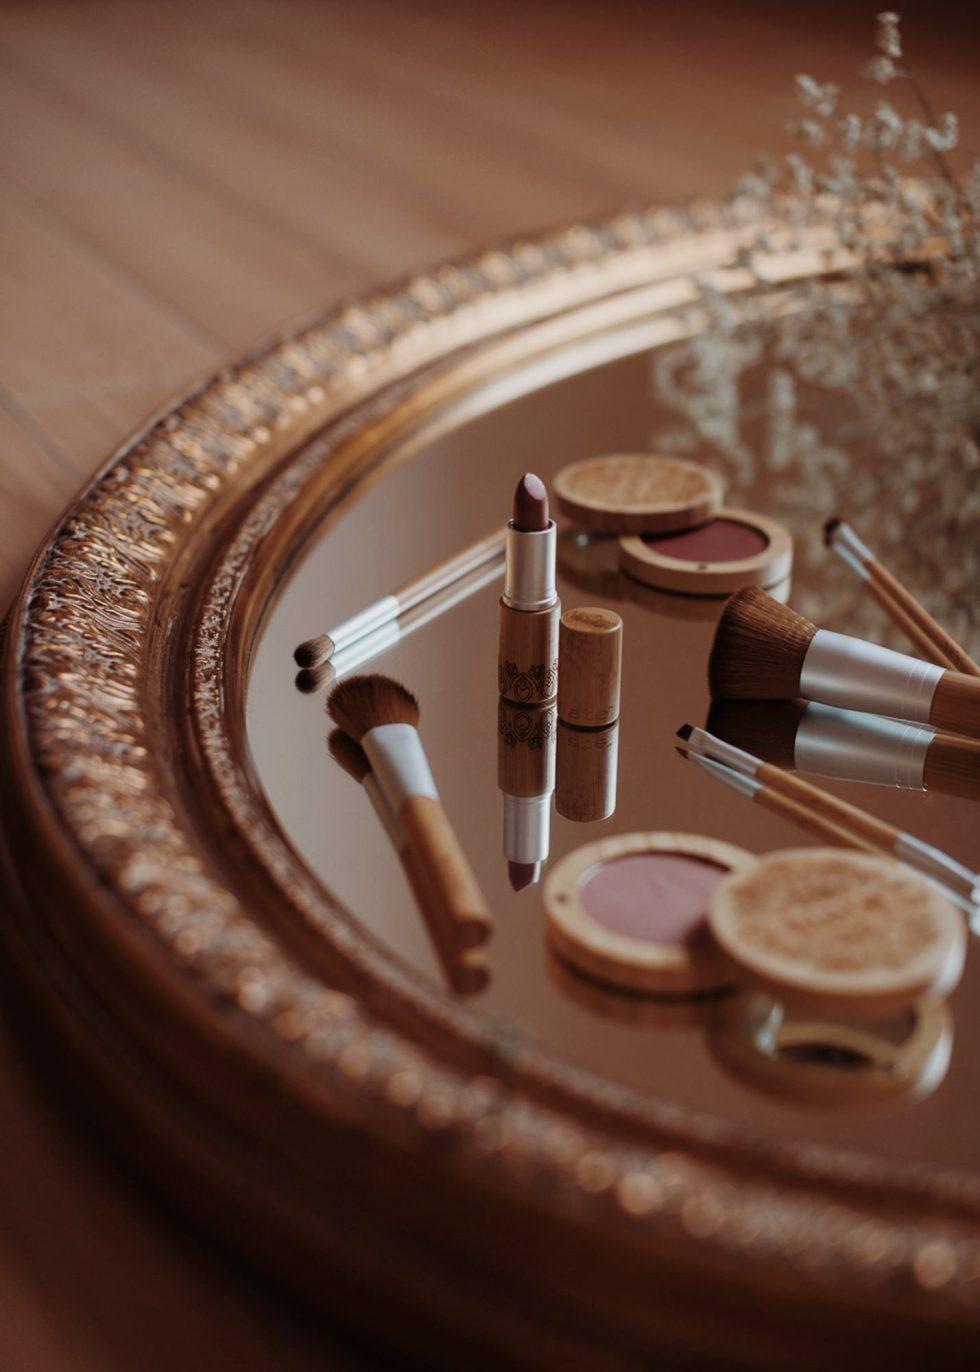 elate-ethical-sustainable-cosmetics-montreal-lifestyle-photographer-laura-g-diaz-2